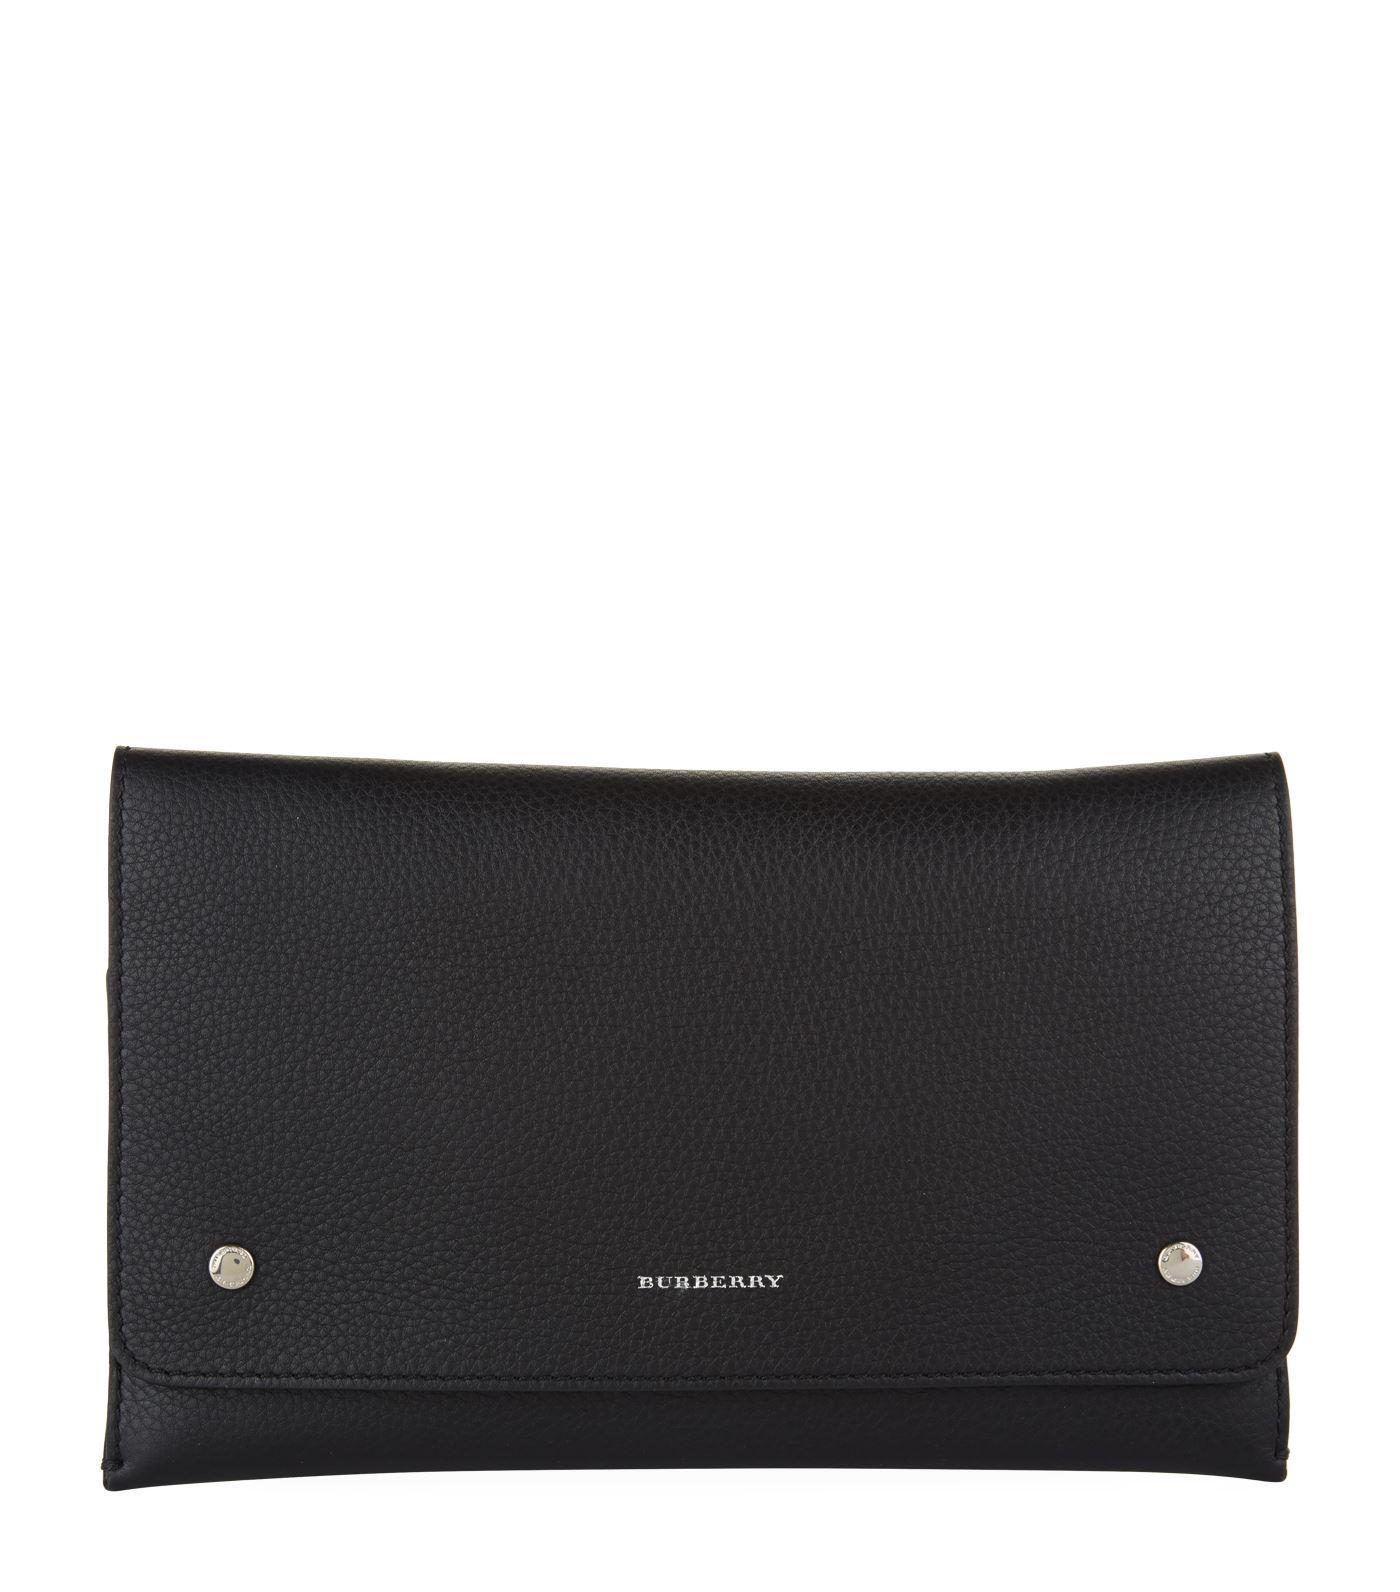 e36c1e098647 Lyst - Burberry Leather Wristlet Clutch in Black